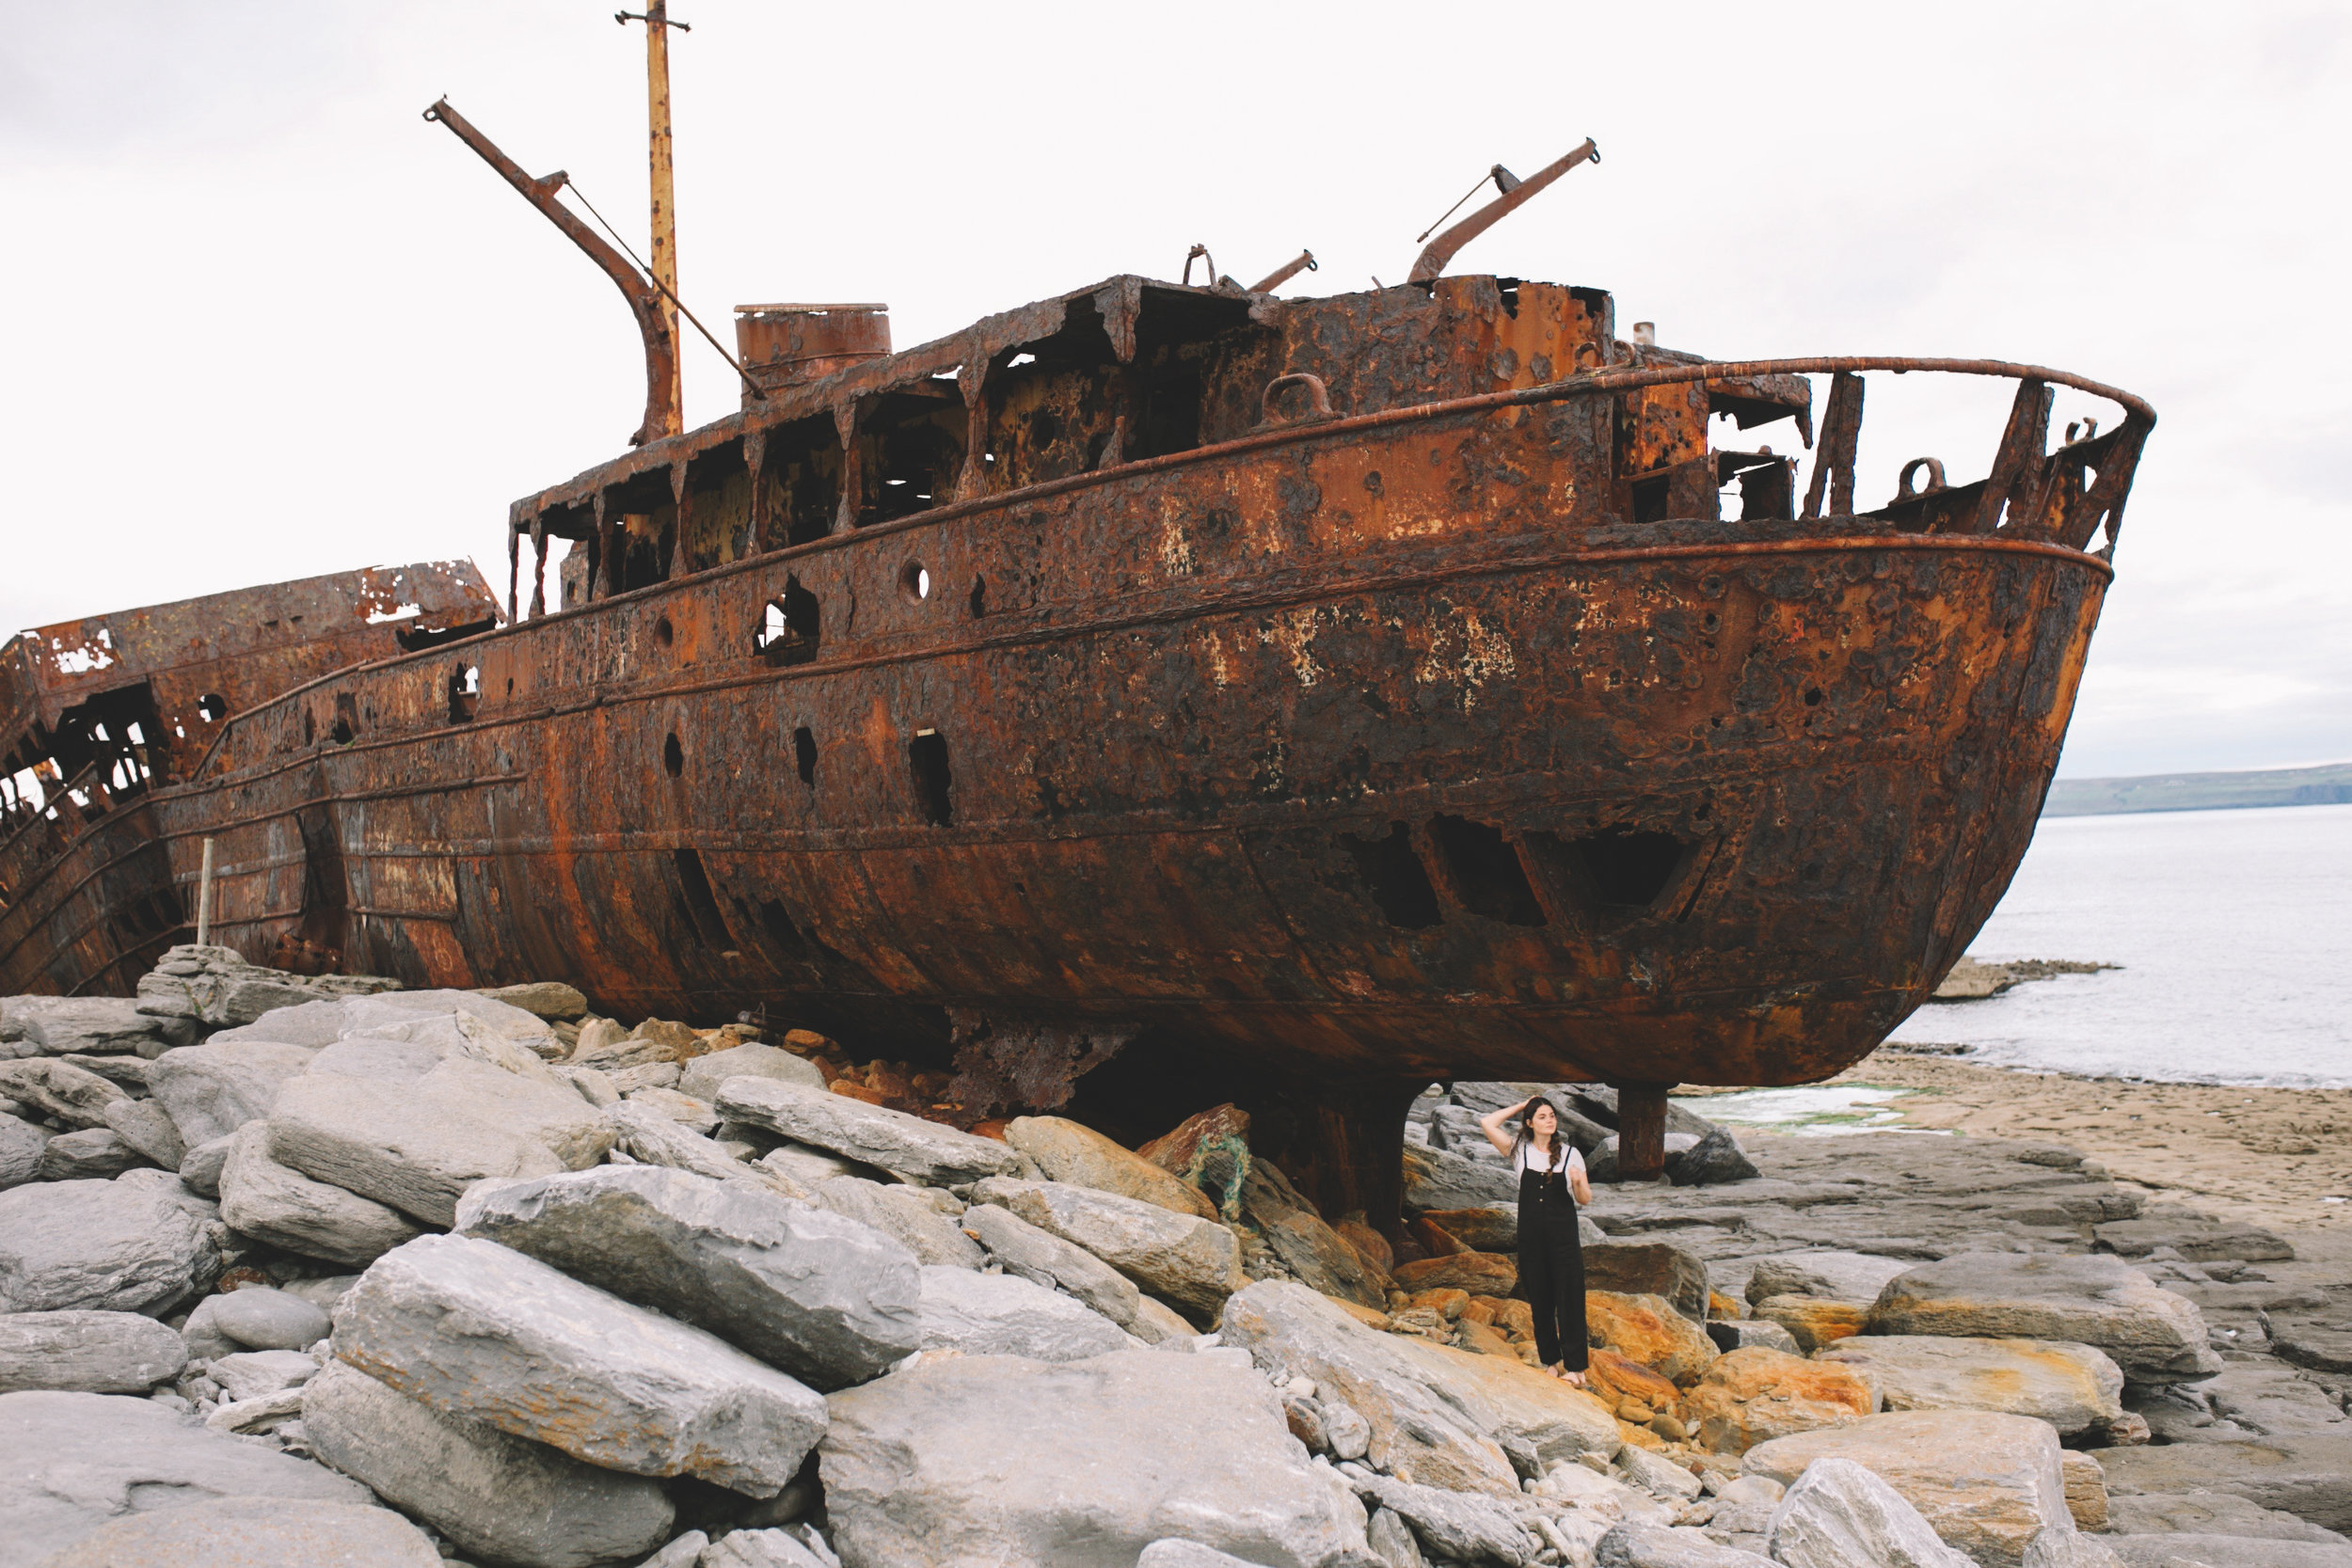 10 Tear Anniversary Trip - Aran Island Inis Orr Cliffs of Moher  (39 of 96).jpg